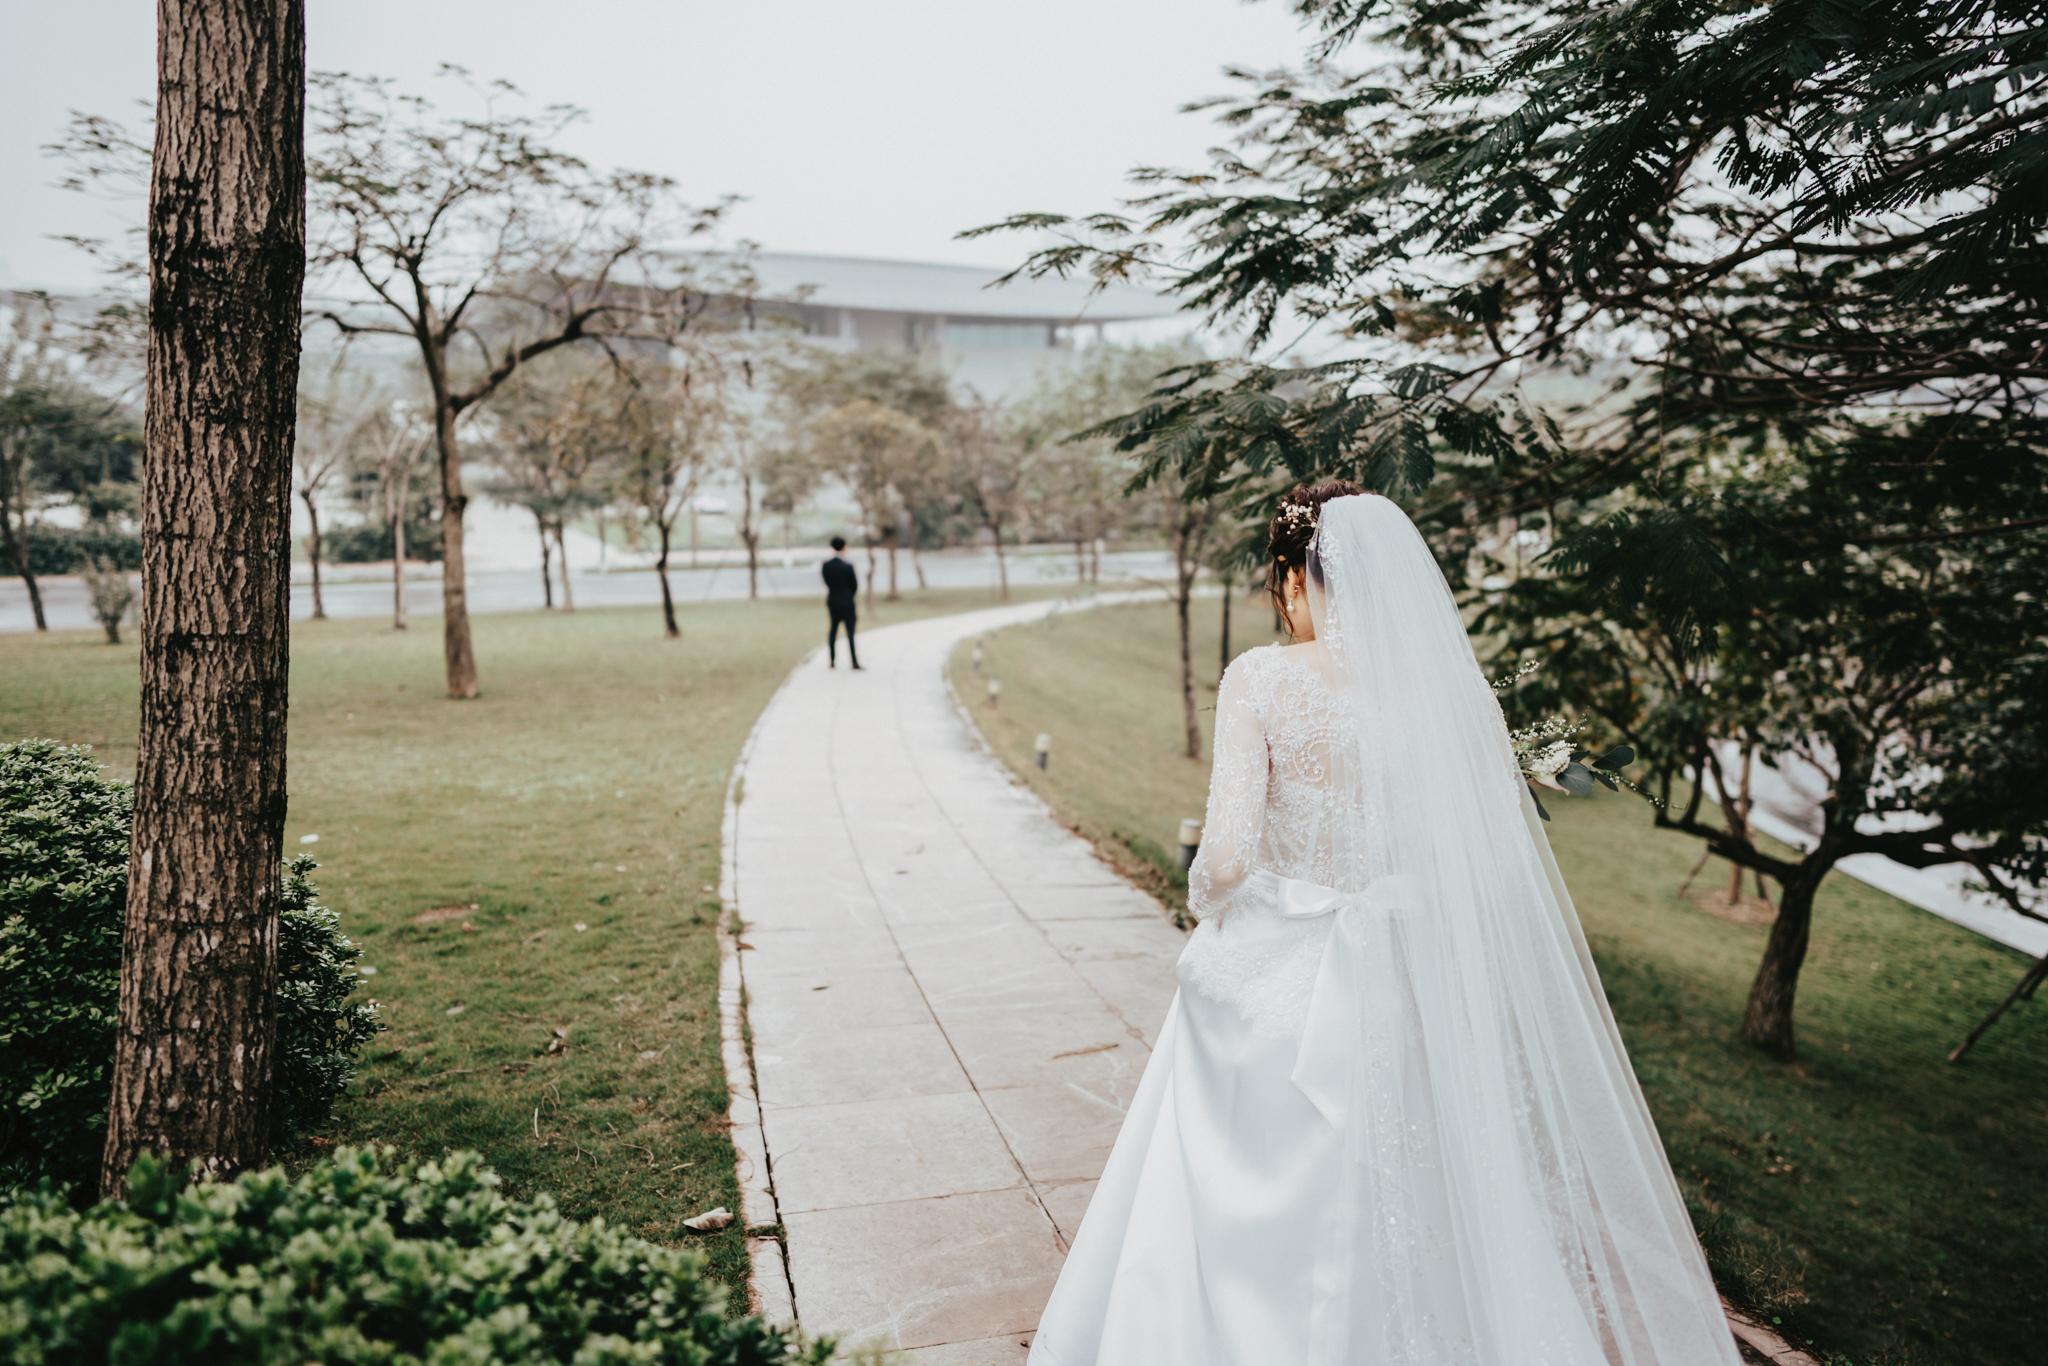 JWMarriott Ha Noi Intimate Wedding of Trang Hi well captured by Hipster Wedding Vietnam Wedding Photographer-35707.jpg